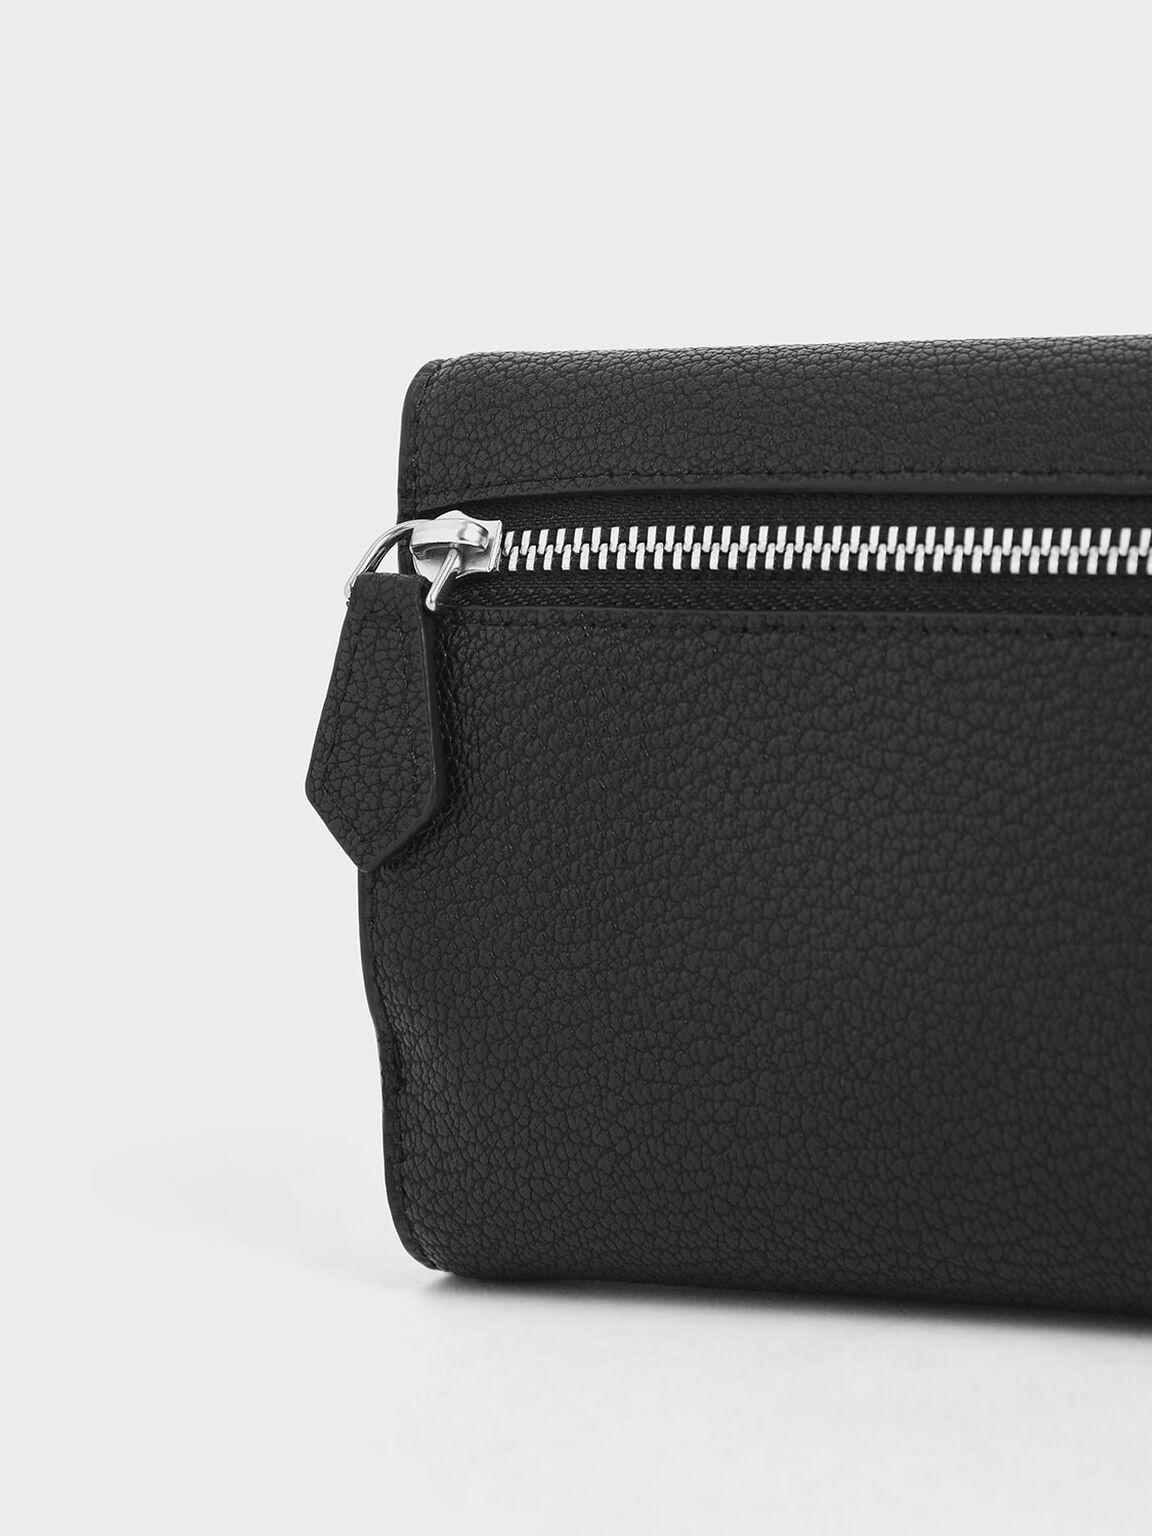 Mini Short Envelope Wallet, Black, hi-res